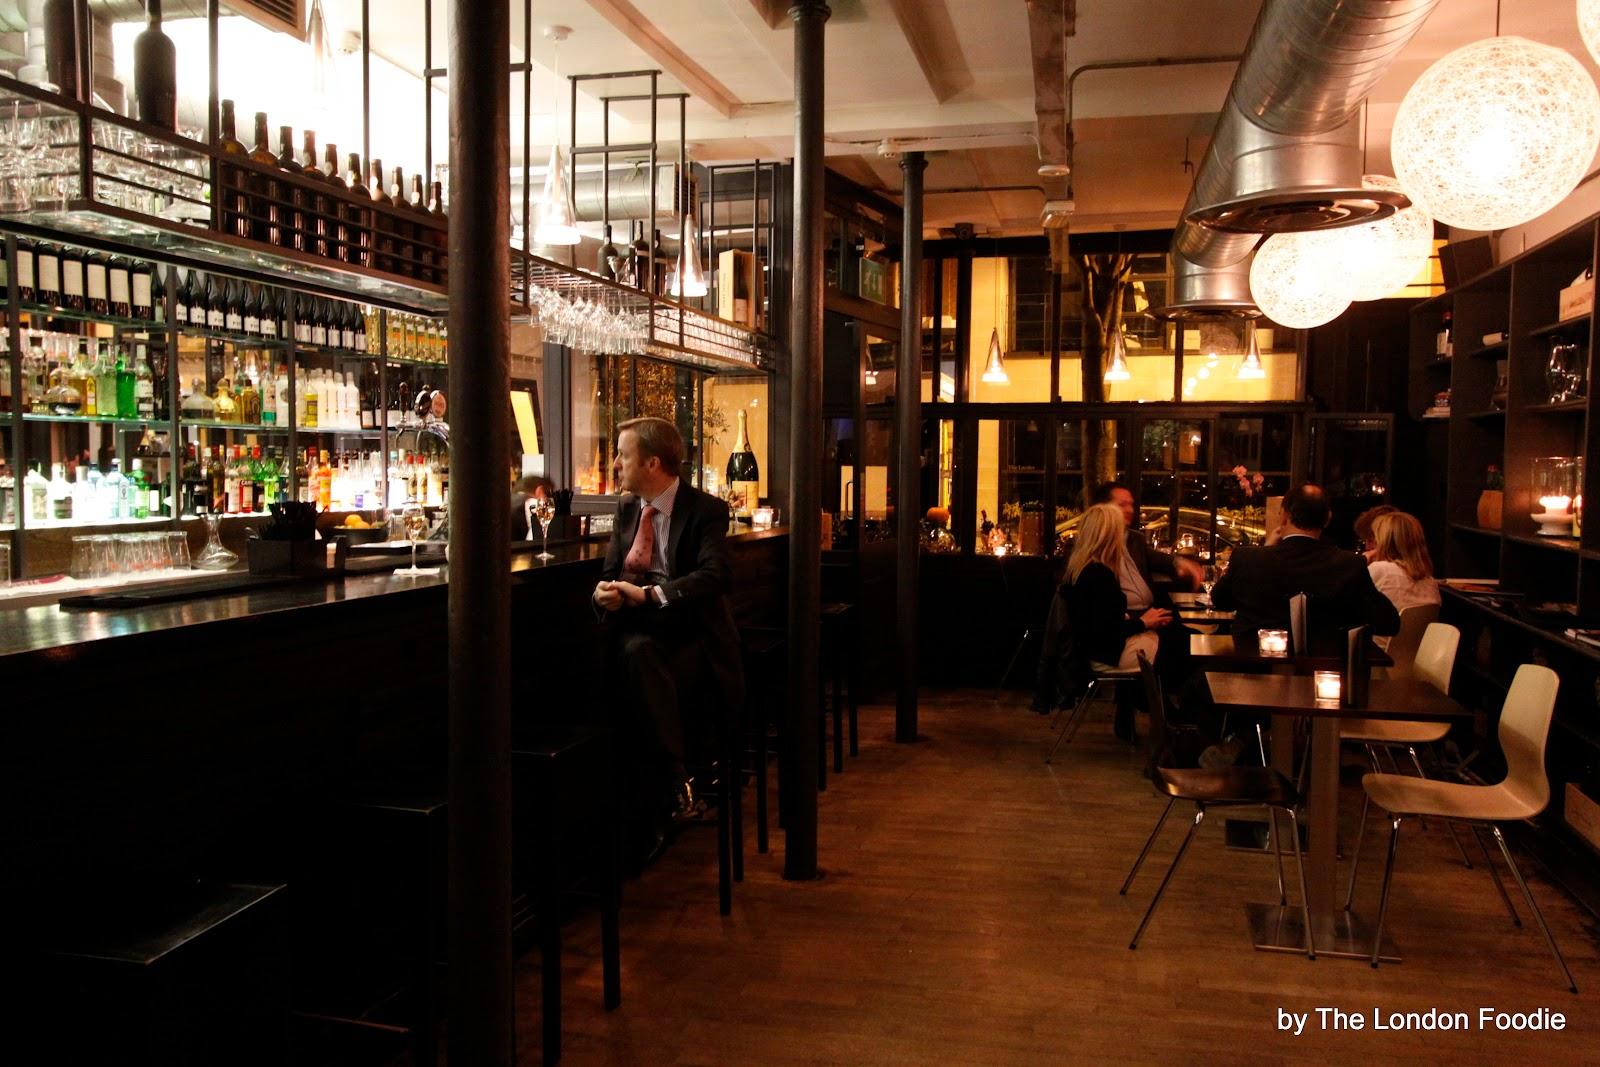 the london foodie london restaurant reviews portal. Black Bedroom Furniture Sets. Home Design Ideas